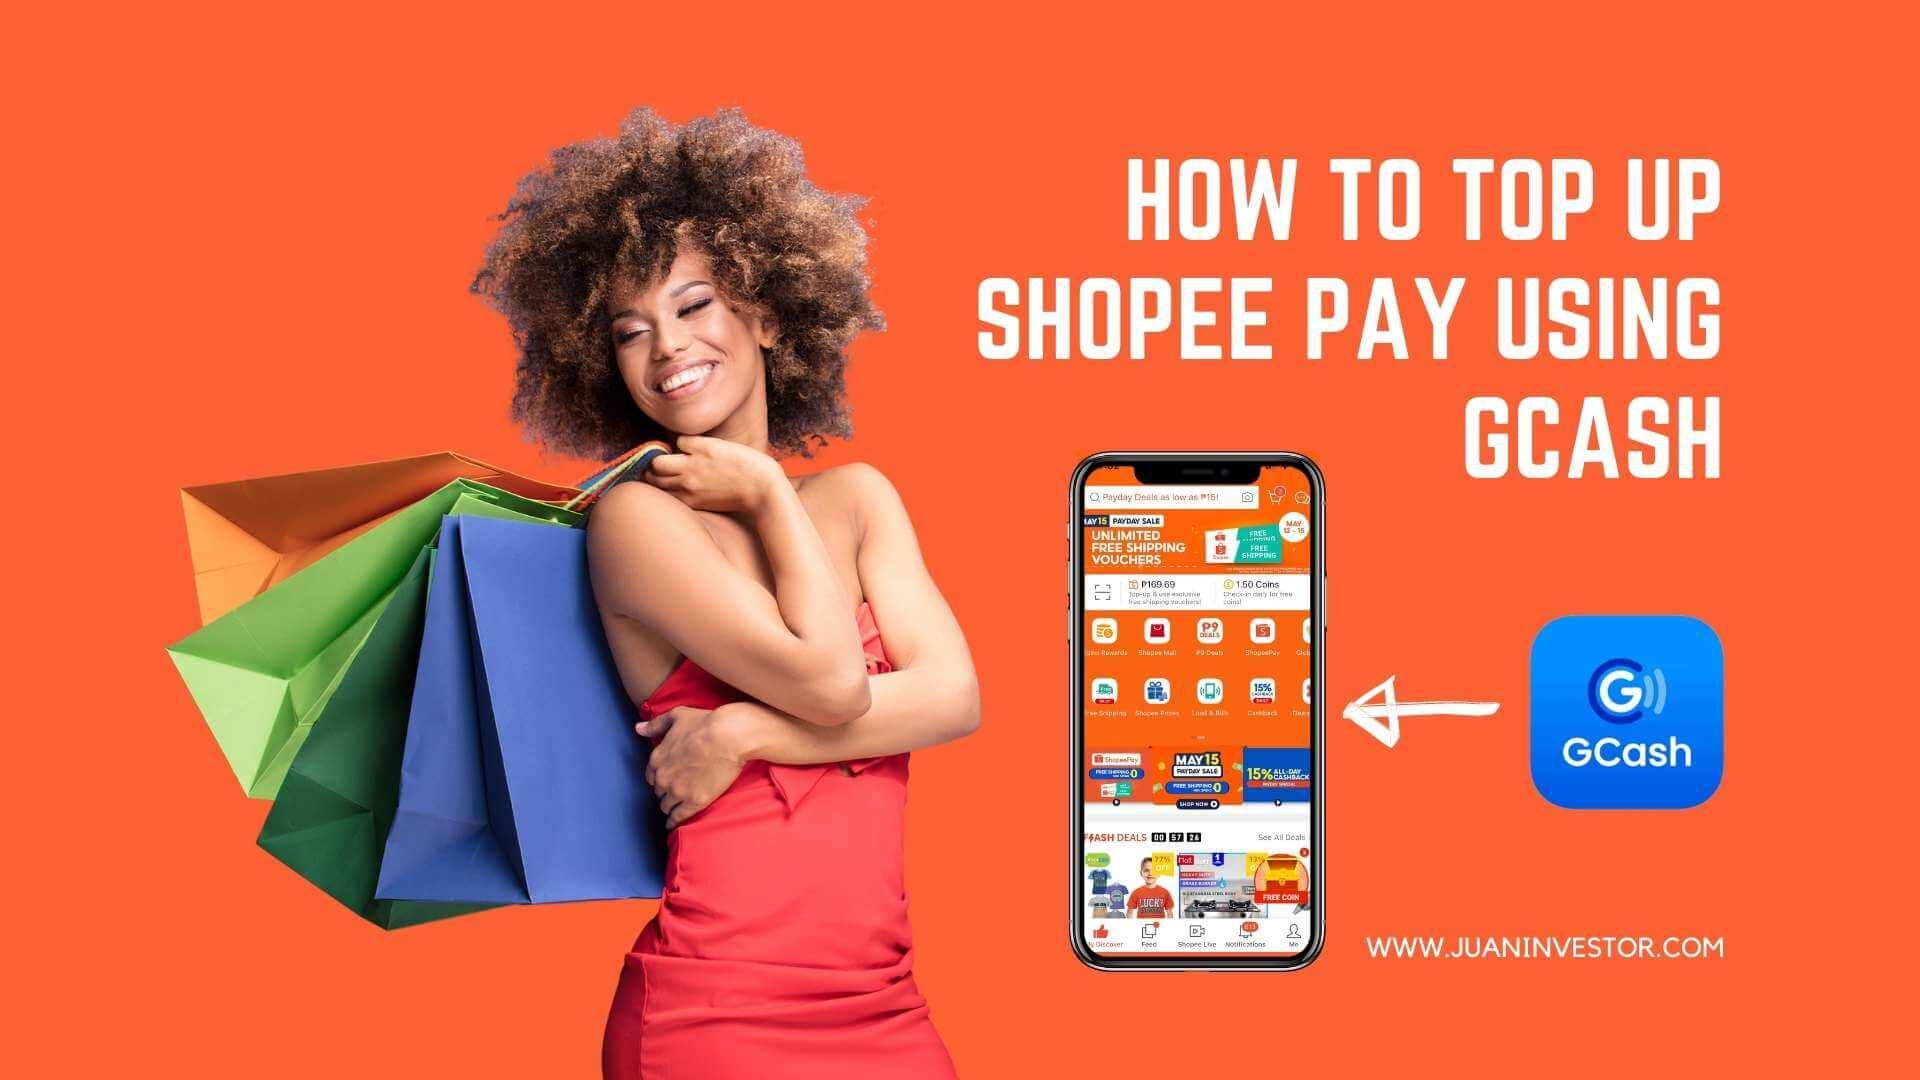 top-up-shopee-pay-using-gcash